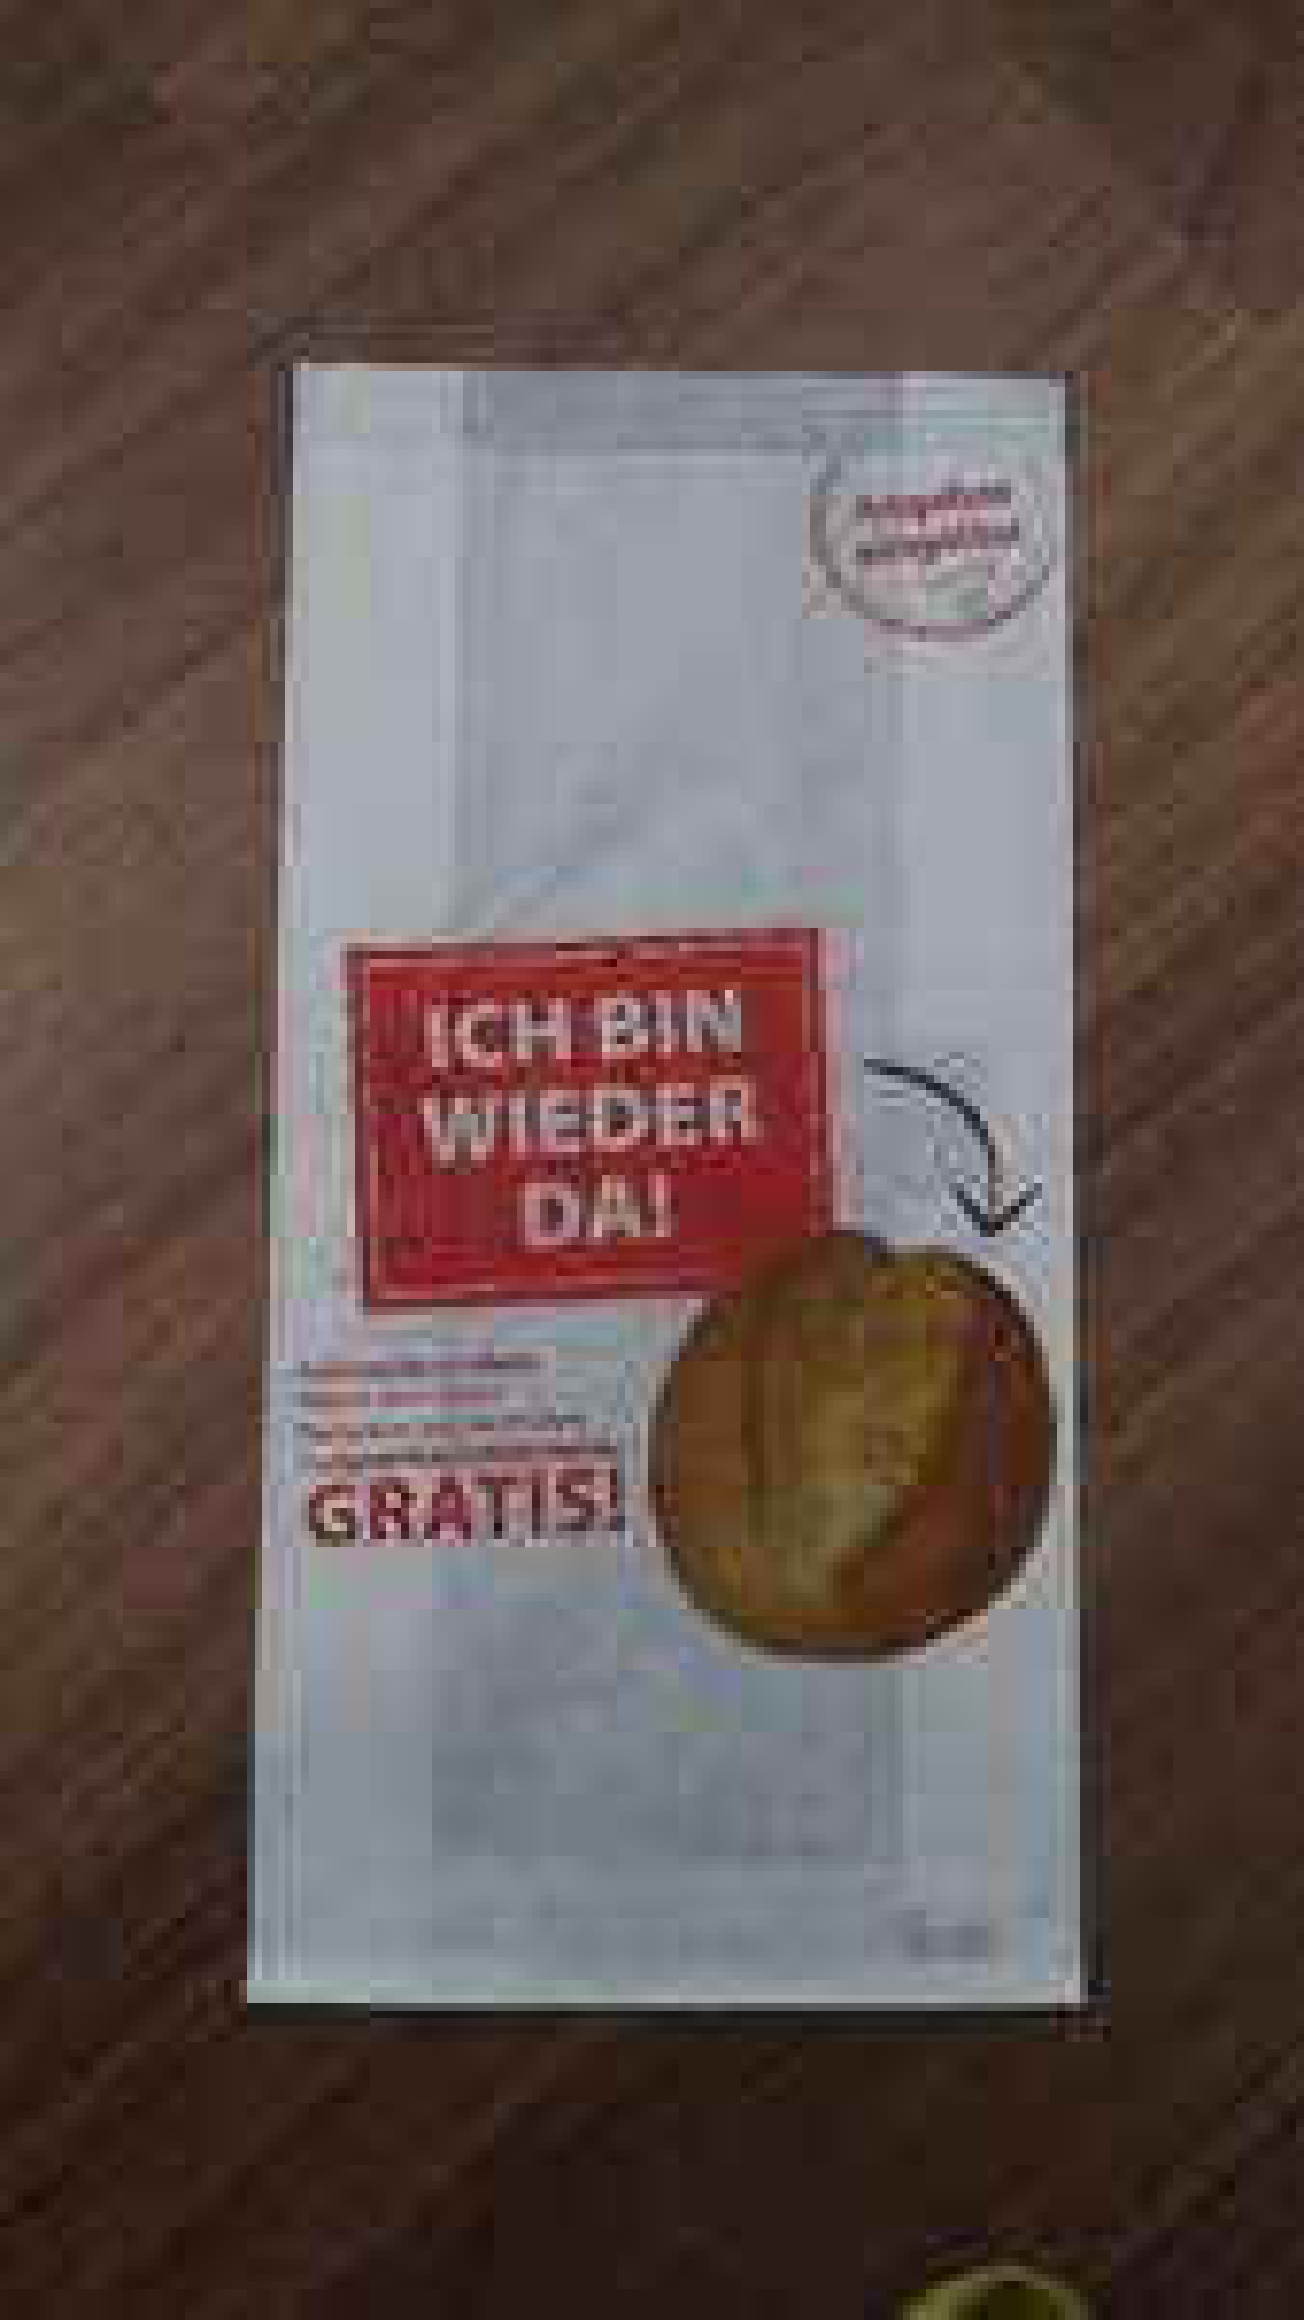 (LOKAL? KÖLN) Gratis Brötchen, Bäckerei Oebel